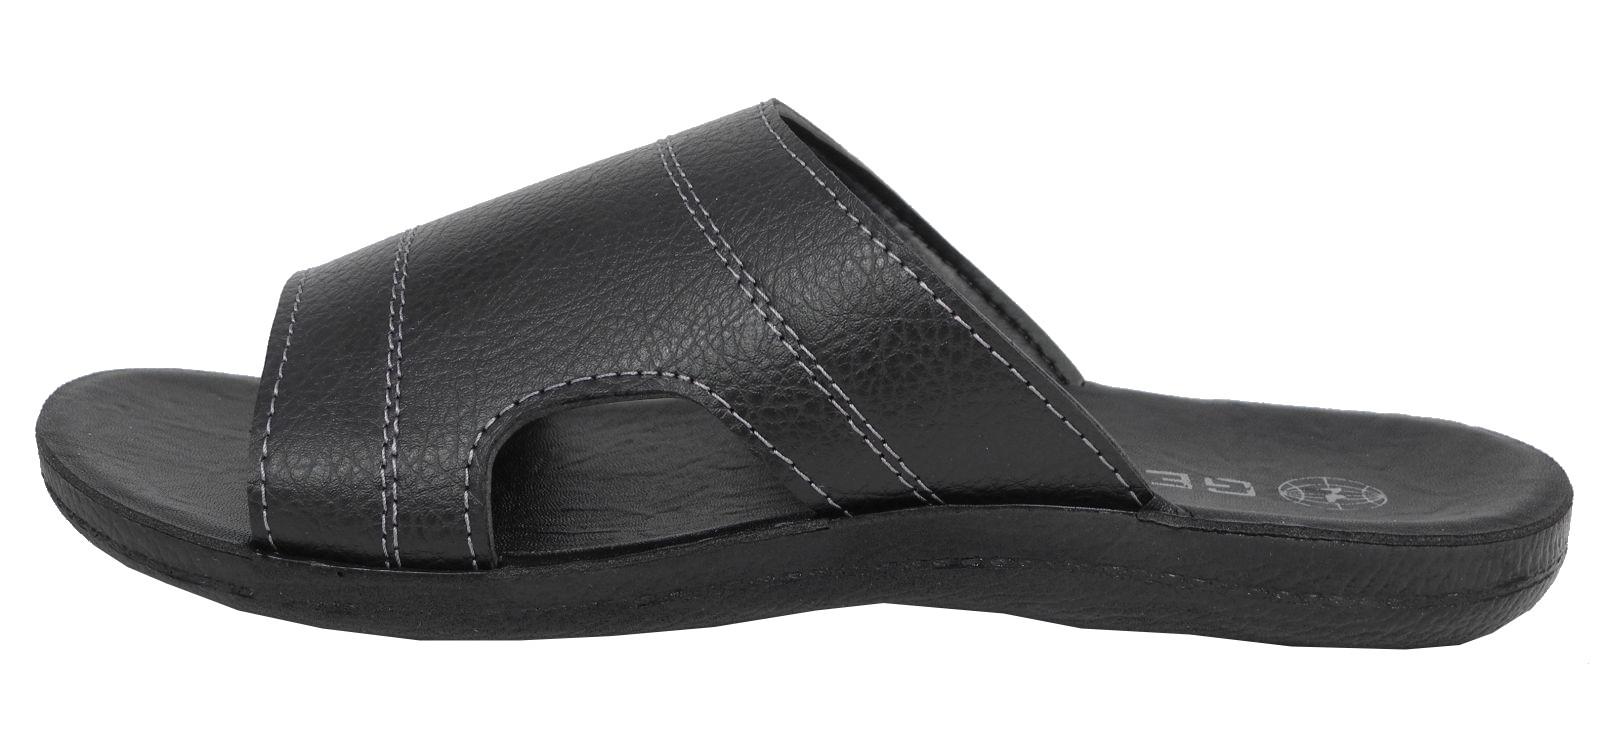 Black jesus sandals - Mens Gezer Leather Look Mule Style Jesus Sandals